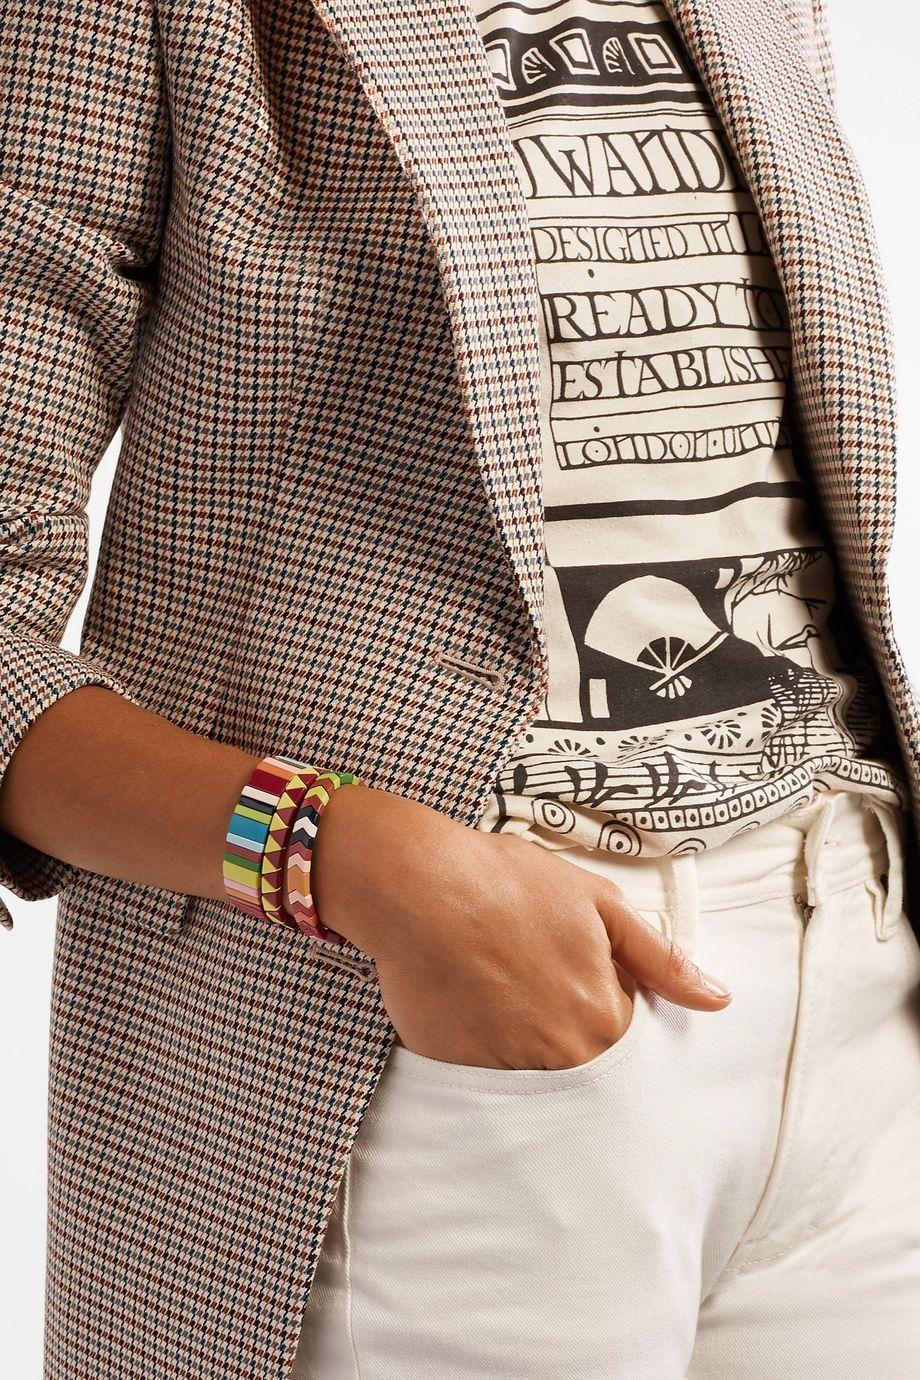 Roxanne Assoulin Picnic Blanket 搪瓷手链(三条装)